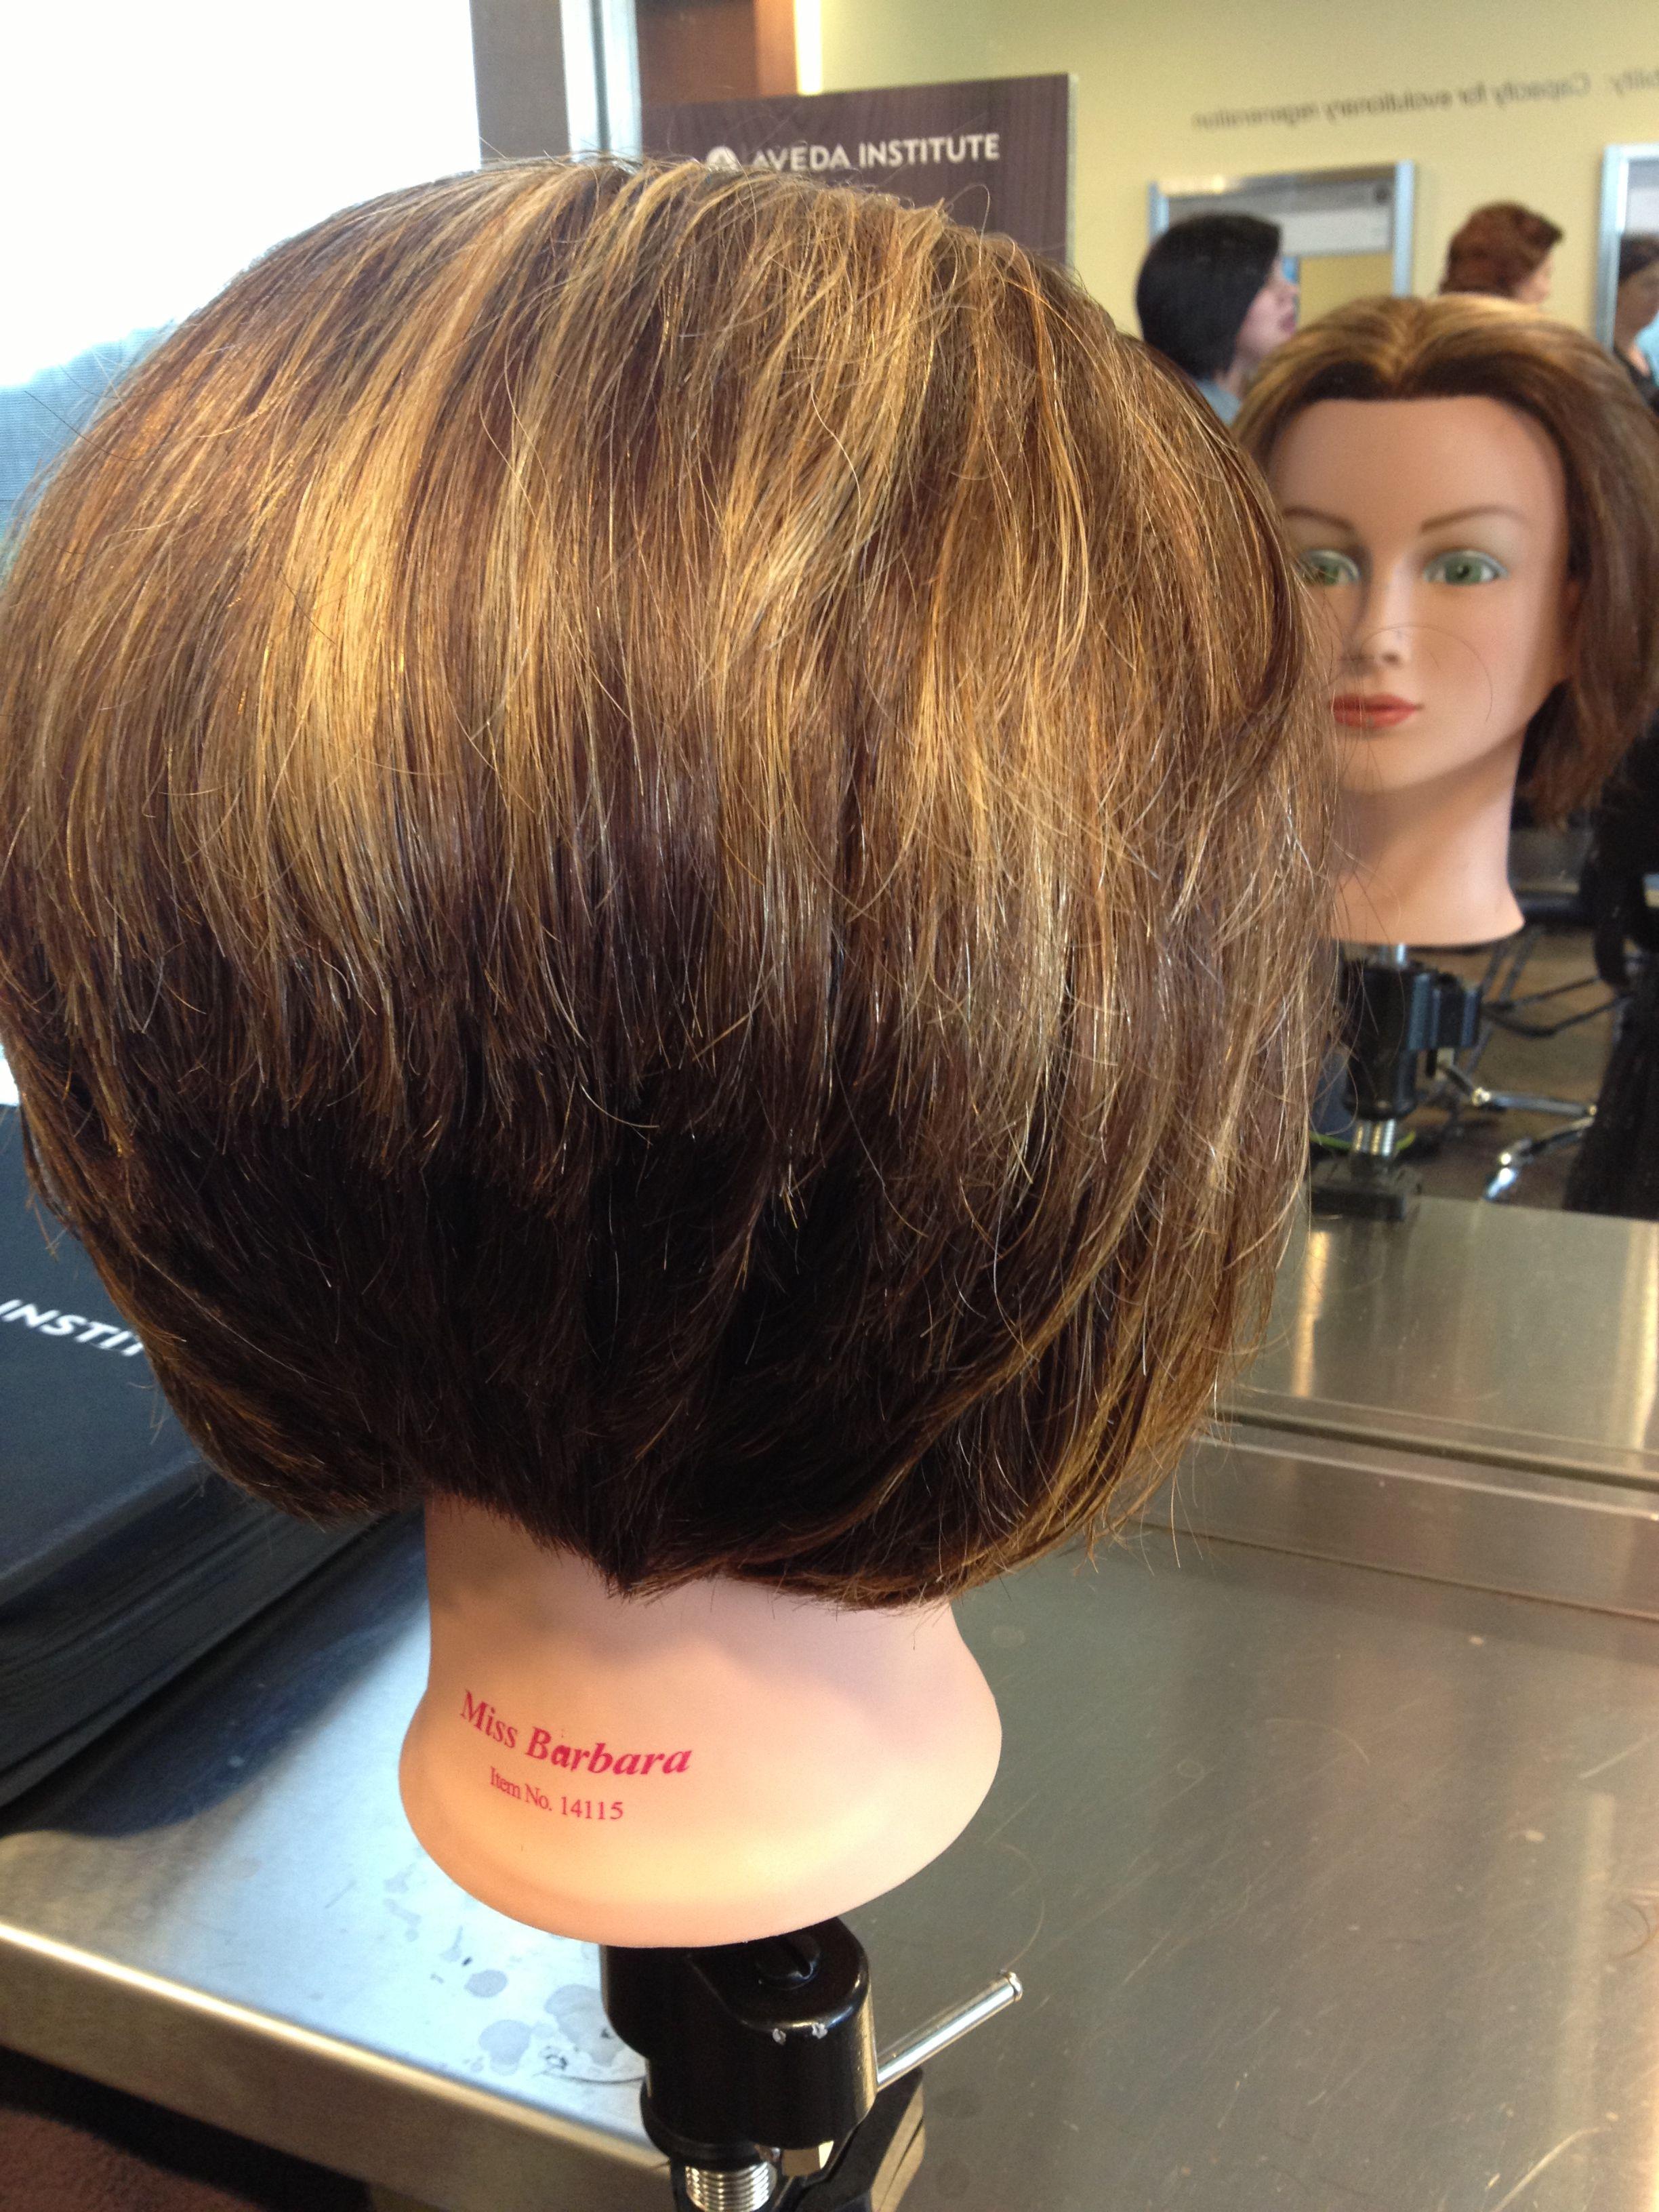 45 to natural graduation haircut with partial highlights | Hair highlights, Graduation ...